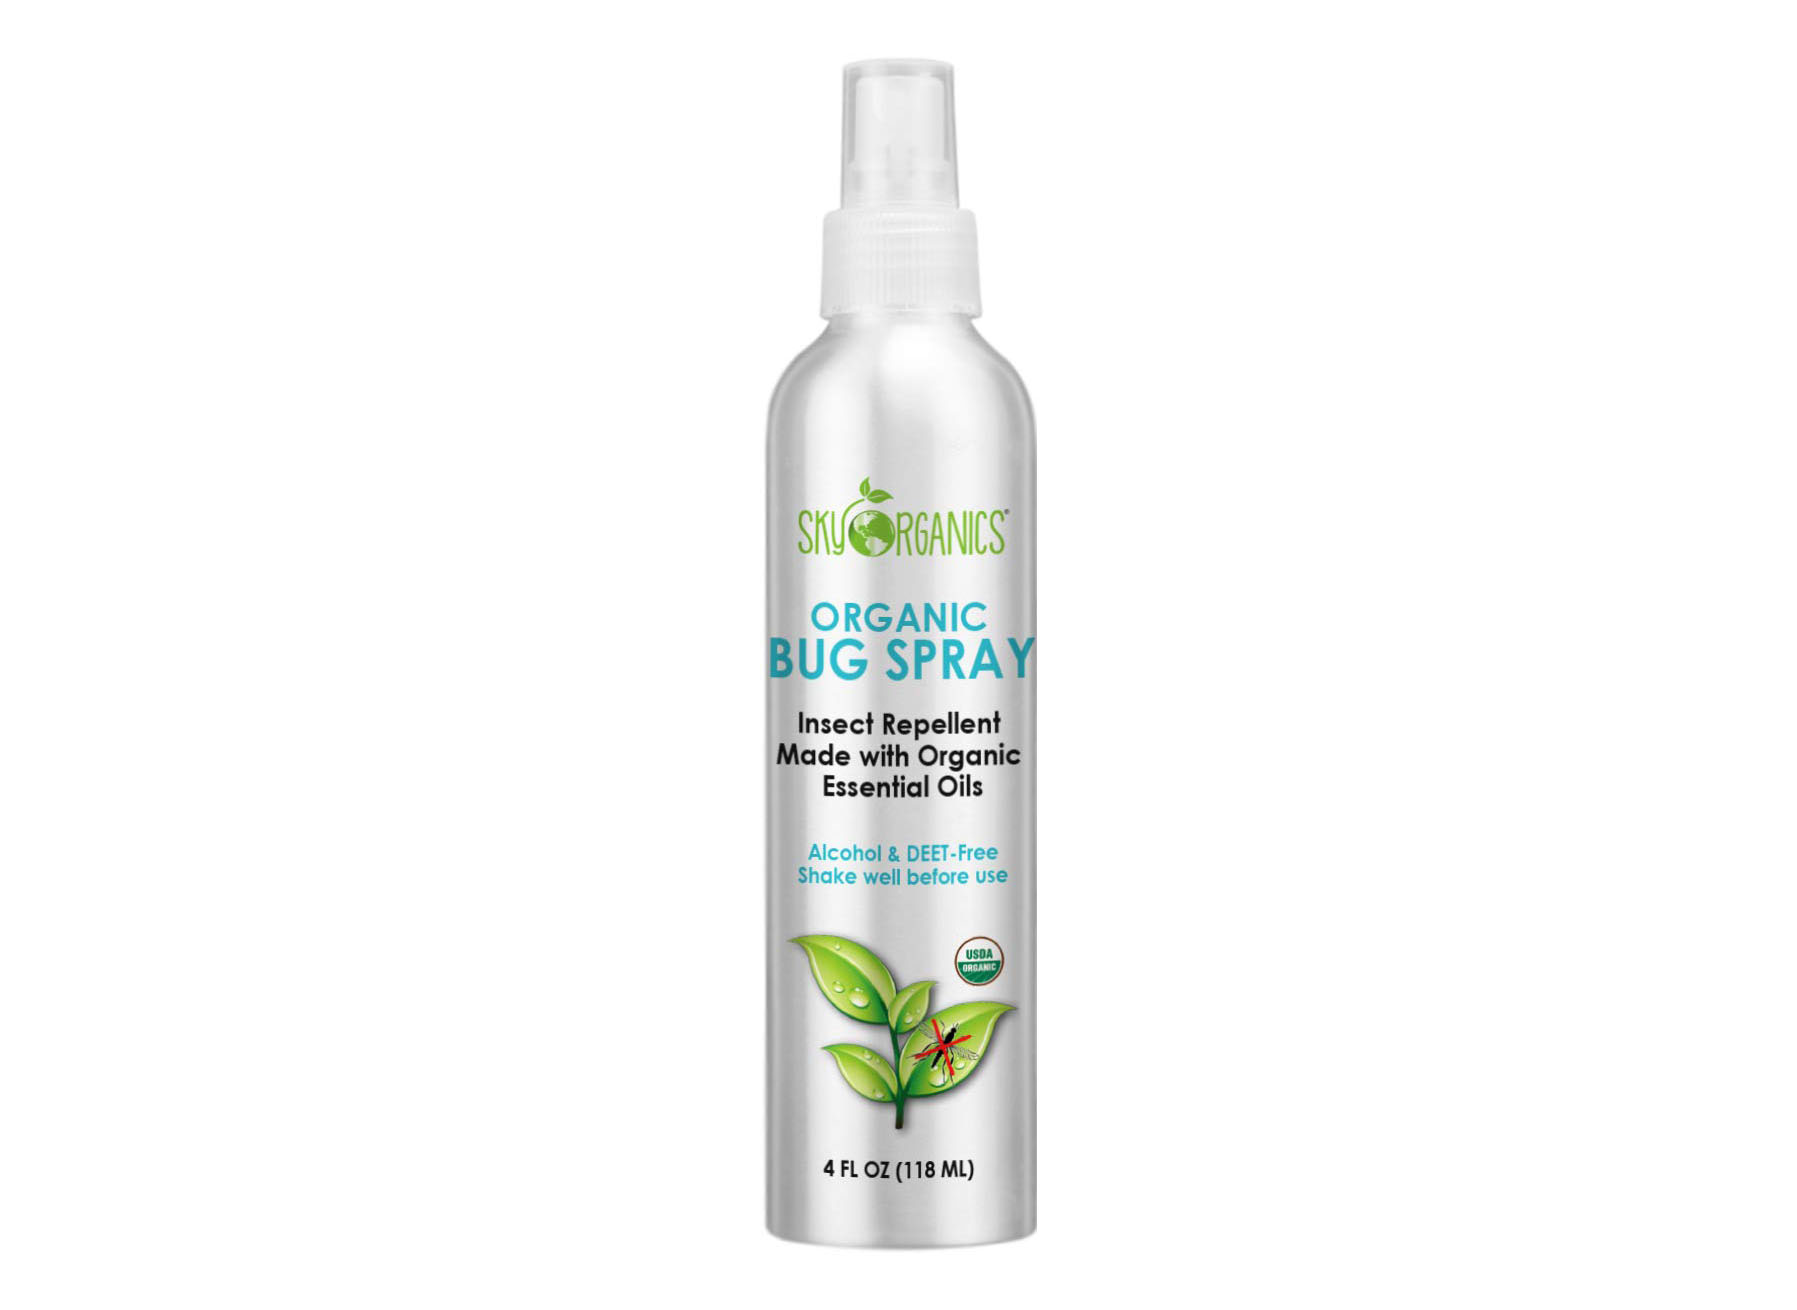 Sky Organics Bug Spray